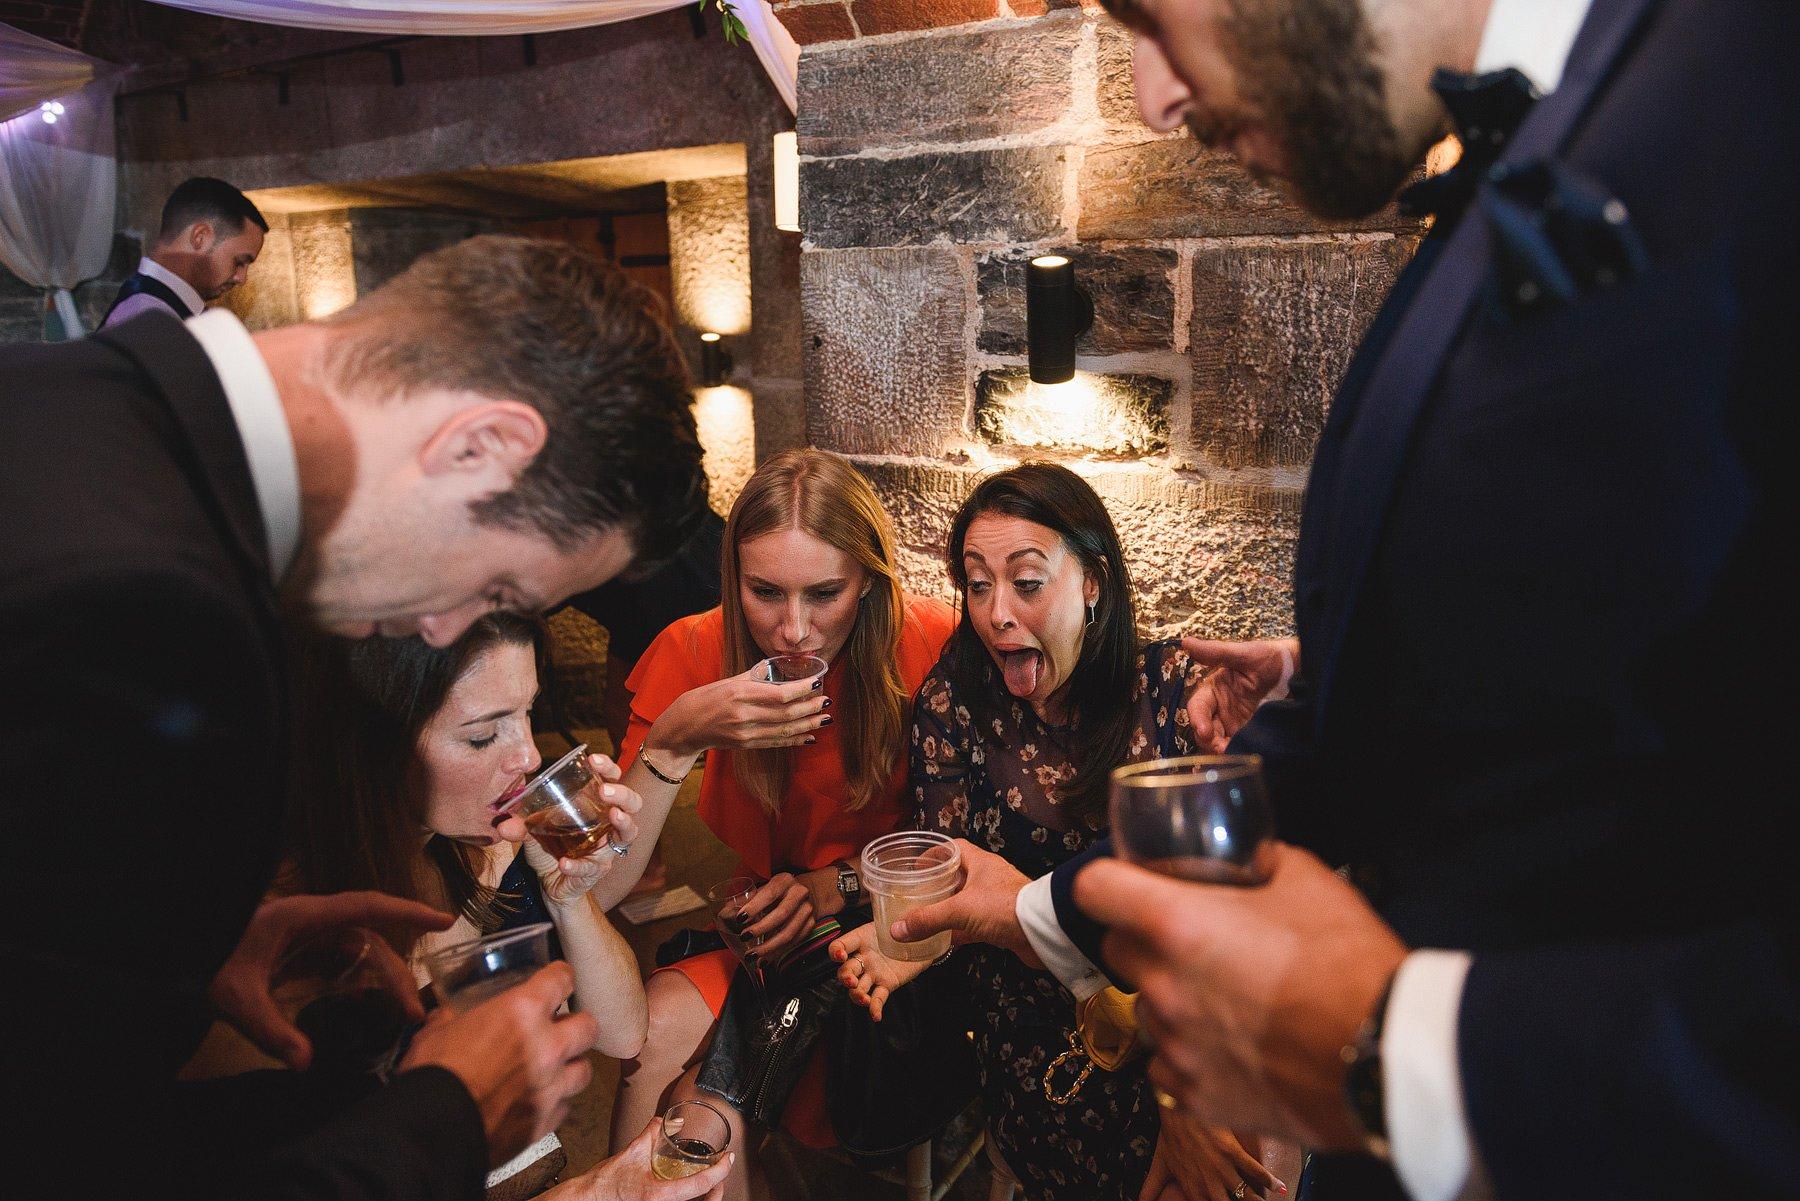 jaeger bombs at weddings